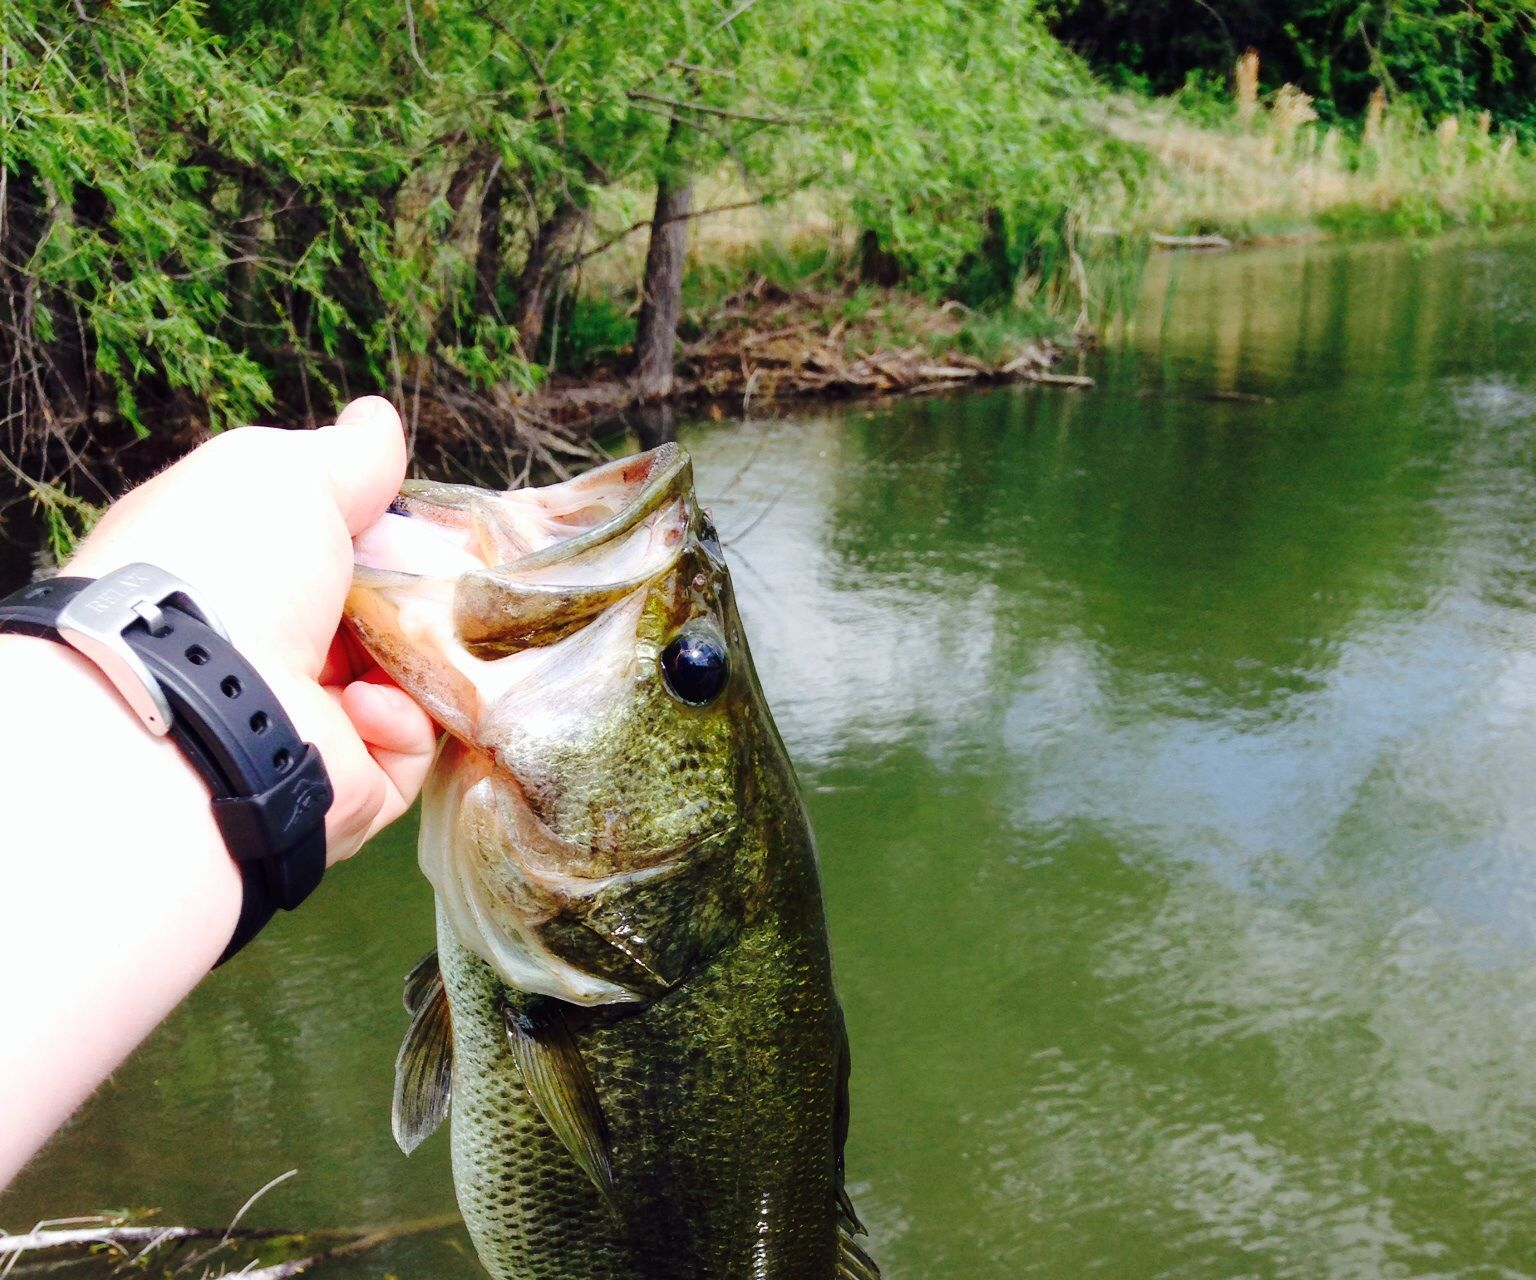 How to re-spool a baitcasting reel